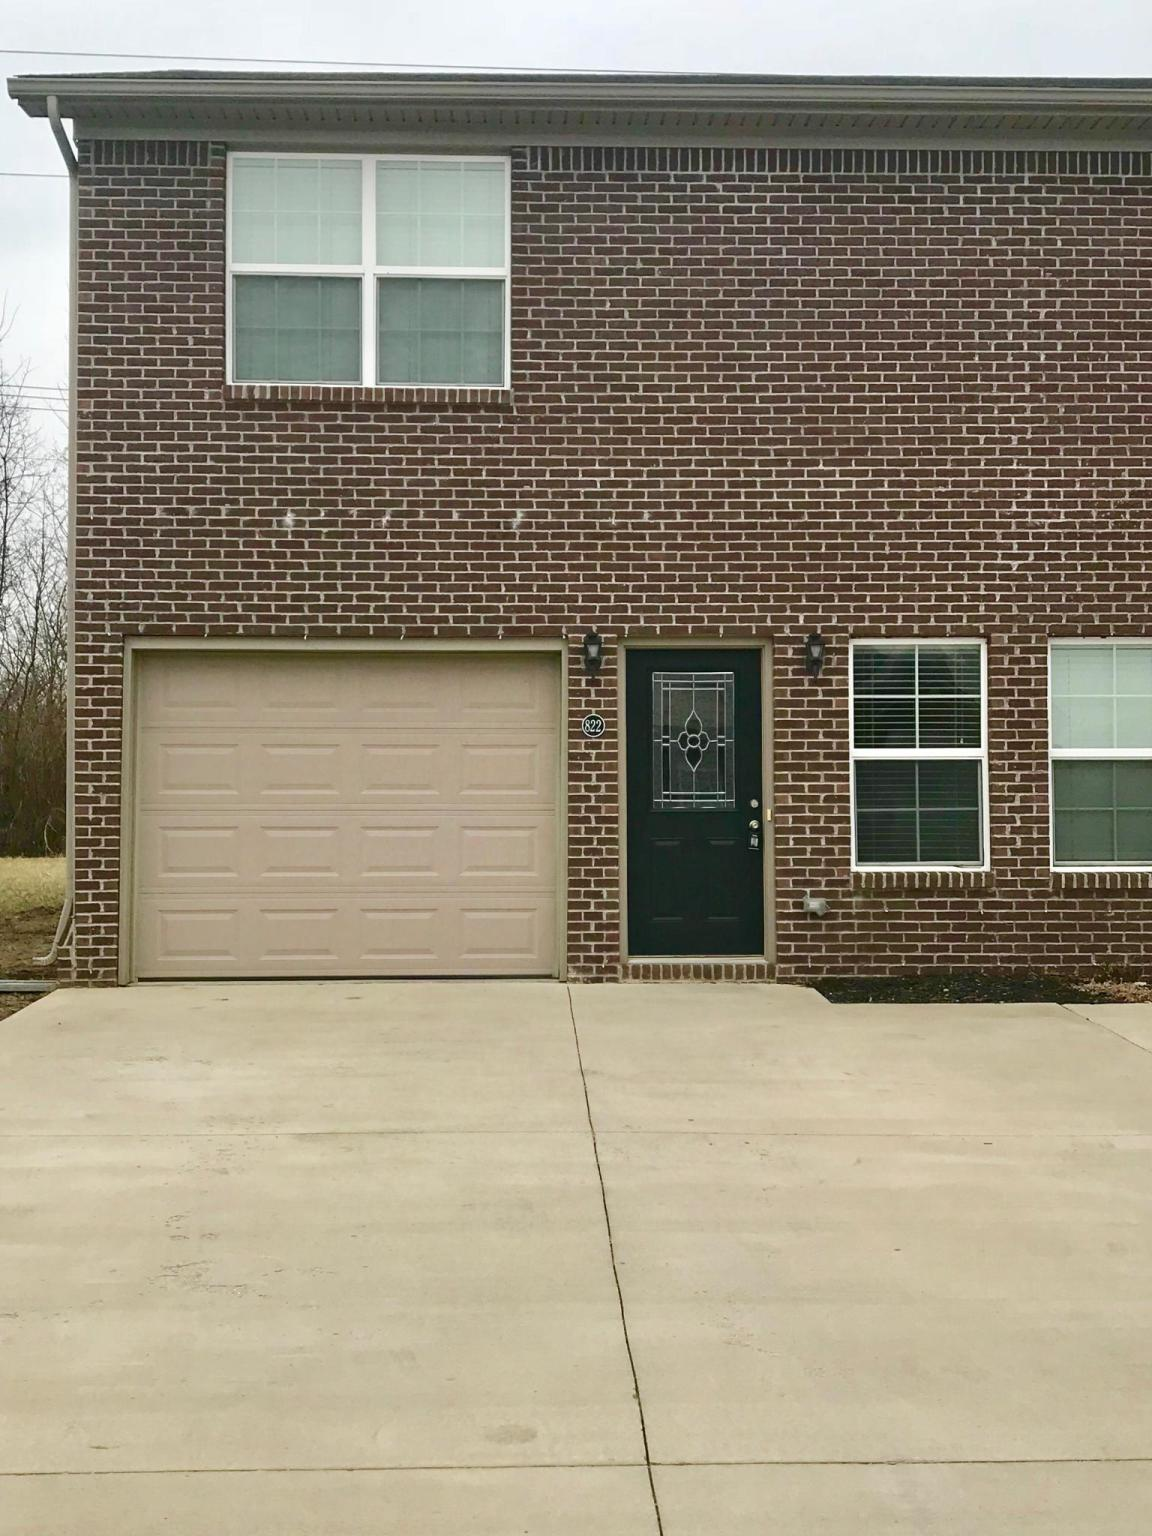 822 Melanie Ln, Richmond, KY 40475 For Rent | Trulia